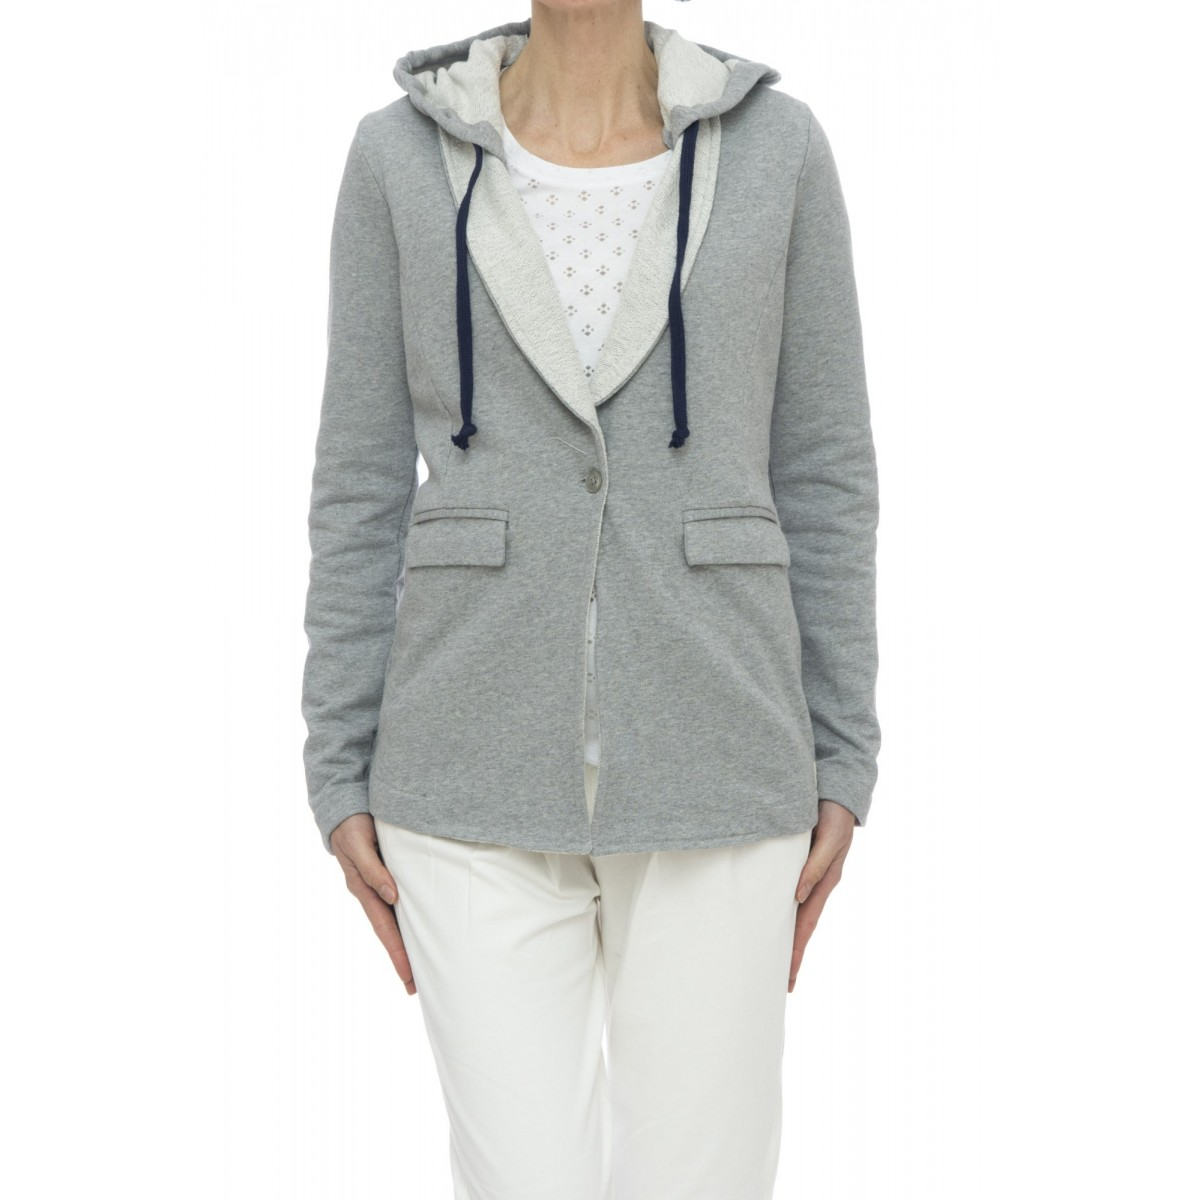 Giacca donna - 537 fv21 giacca